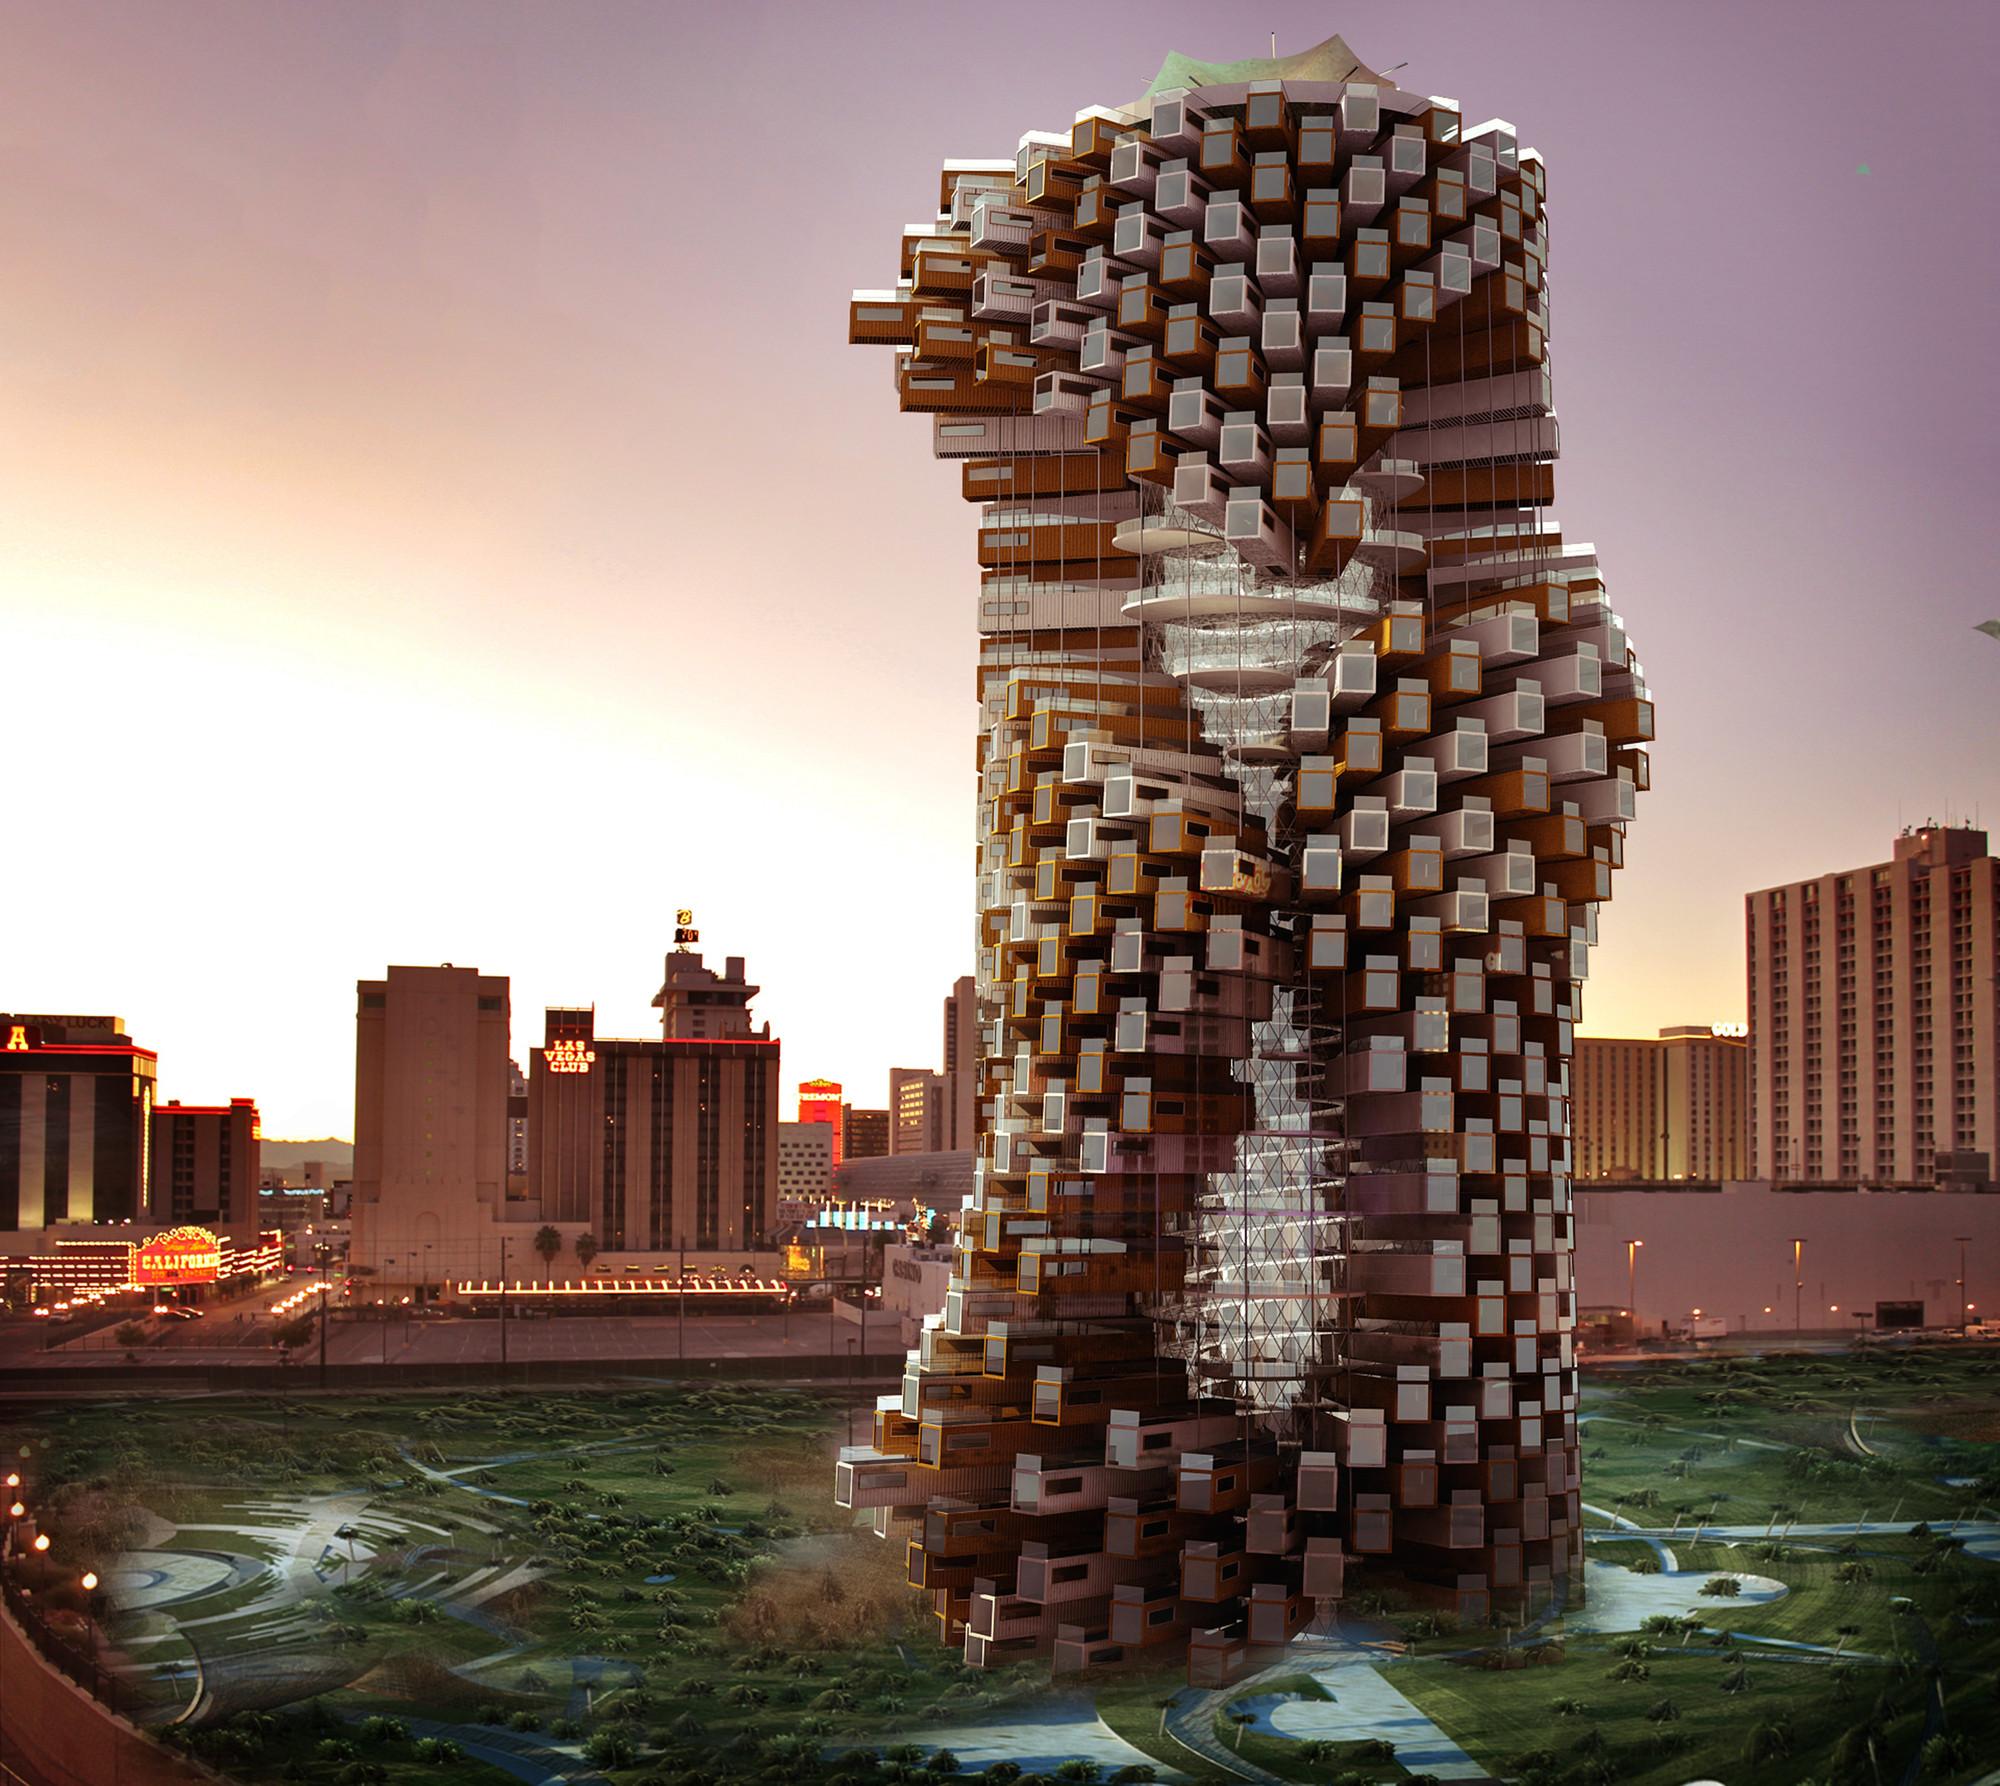 M-Rad Proposes Live-Work Towers to Revitalize Downtown Las Vegas, © M-Rad